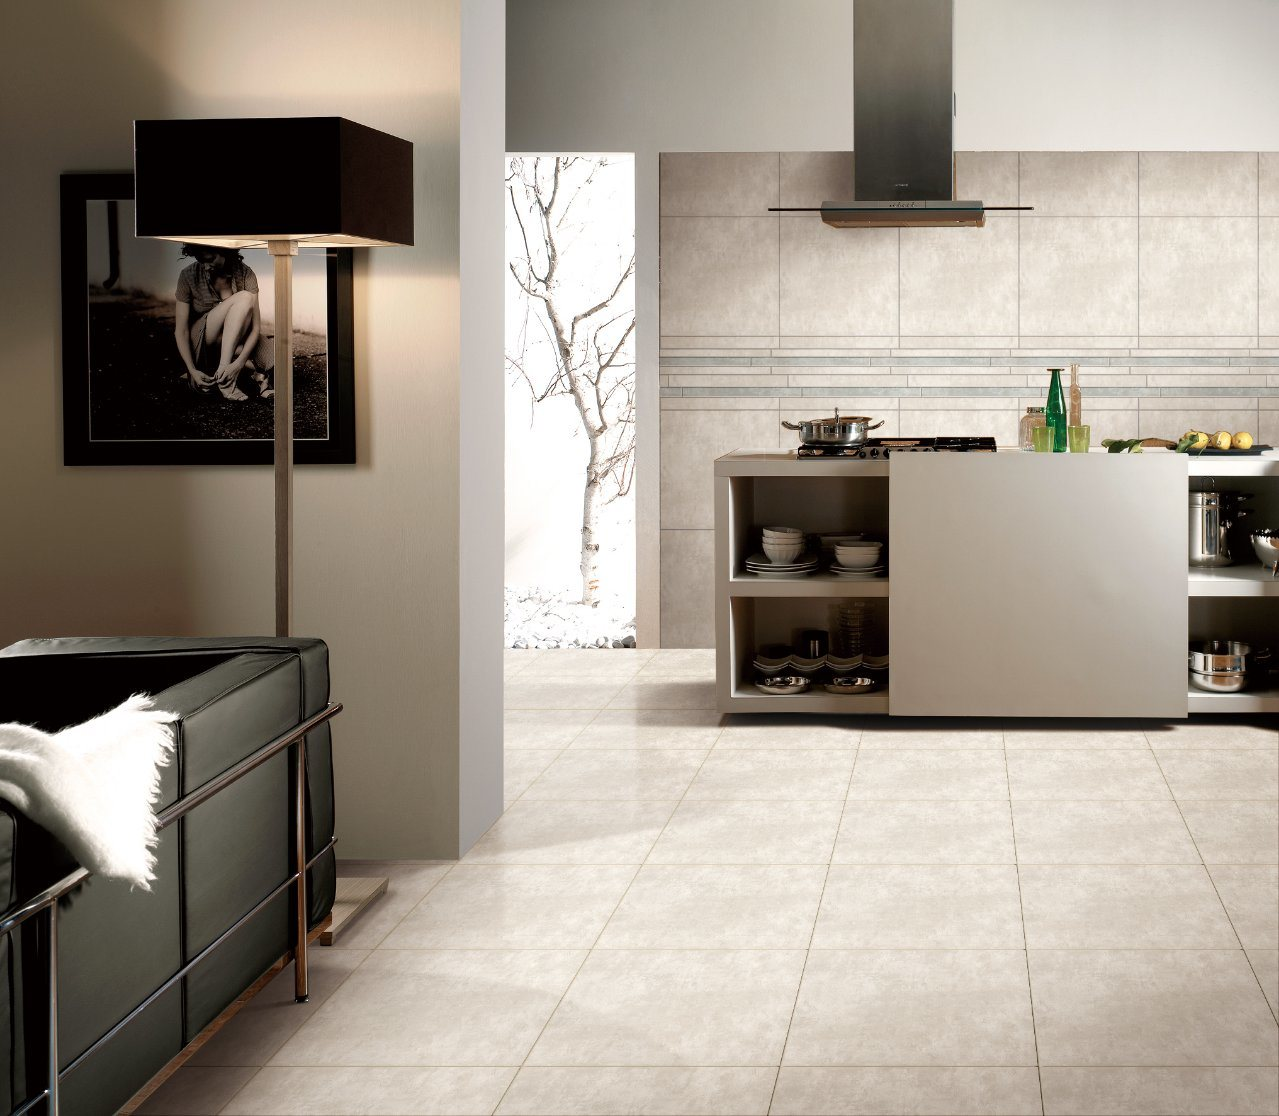 Gaogesi-Series/Cement Look/Hot Sales Matte Finished/Rustic Tile Antique Brick Porcelain Floor Tile